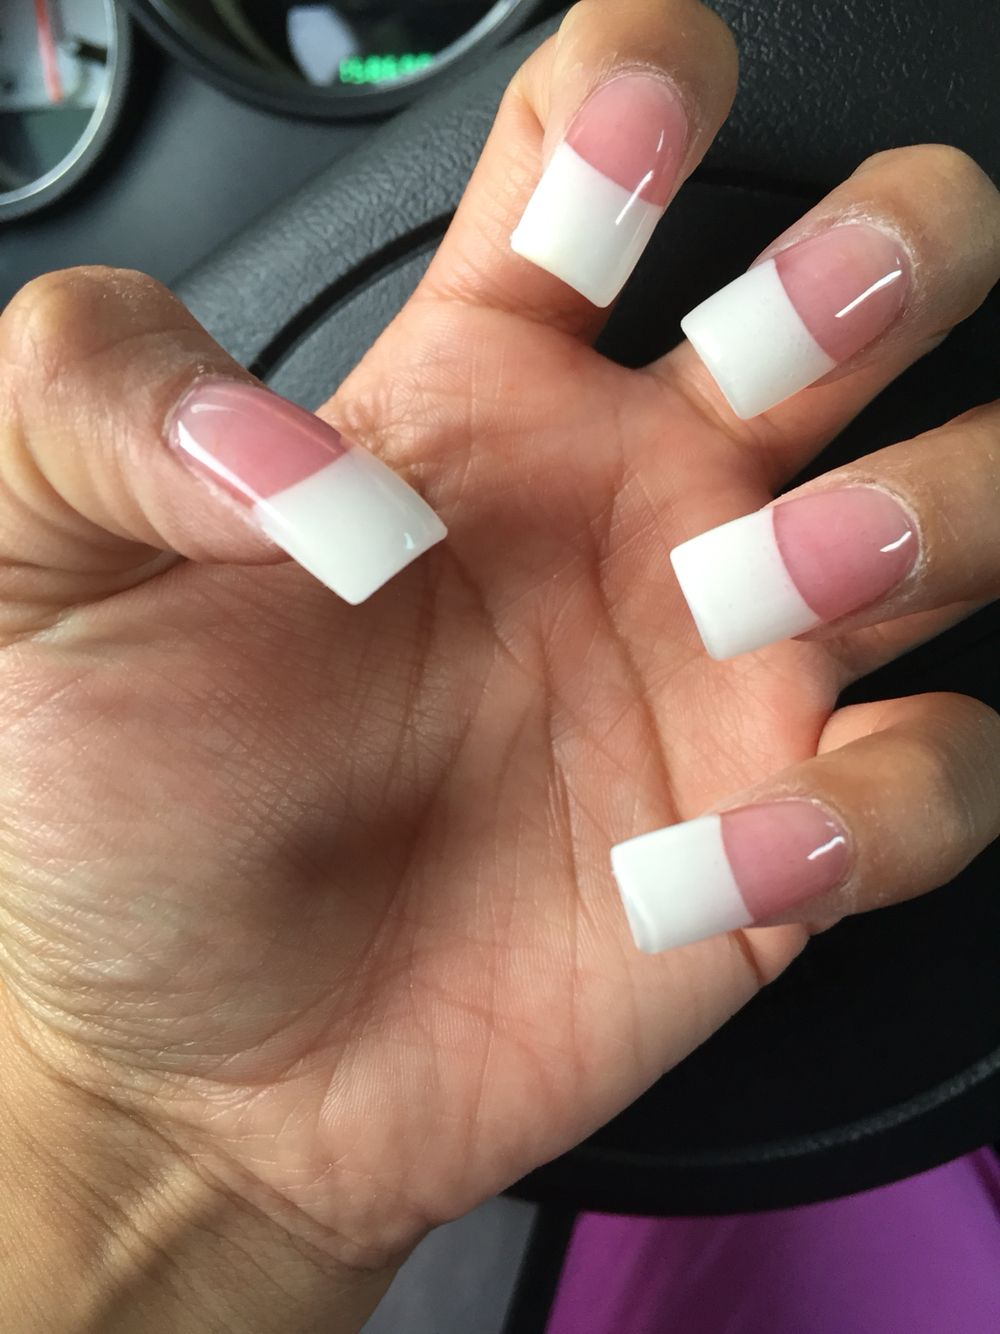 Long White Tip Nails Acrylic Plainwhite Nails White Tip Nails French Tip Acrylic Nails Square Acrylic Nails